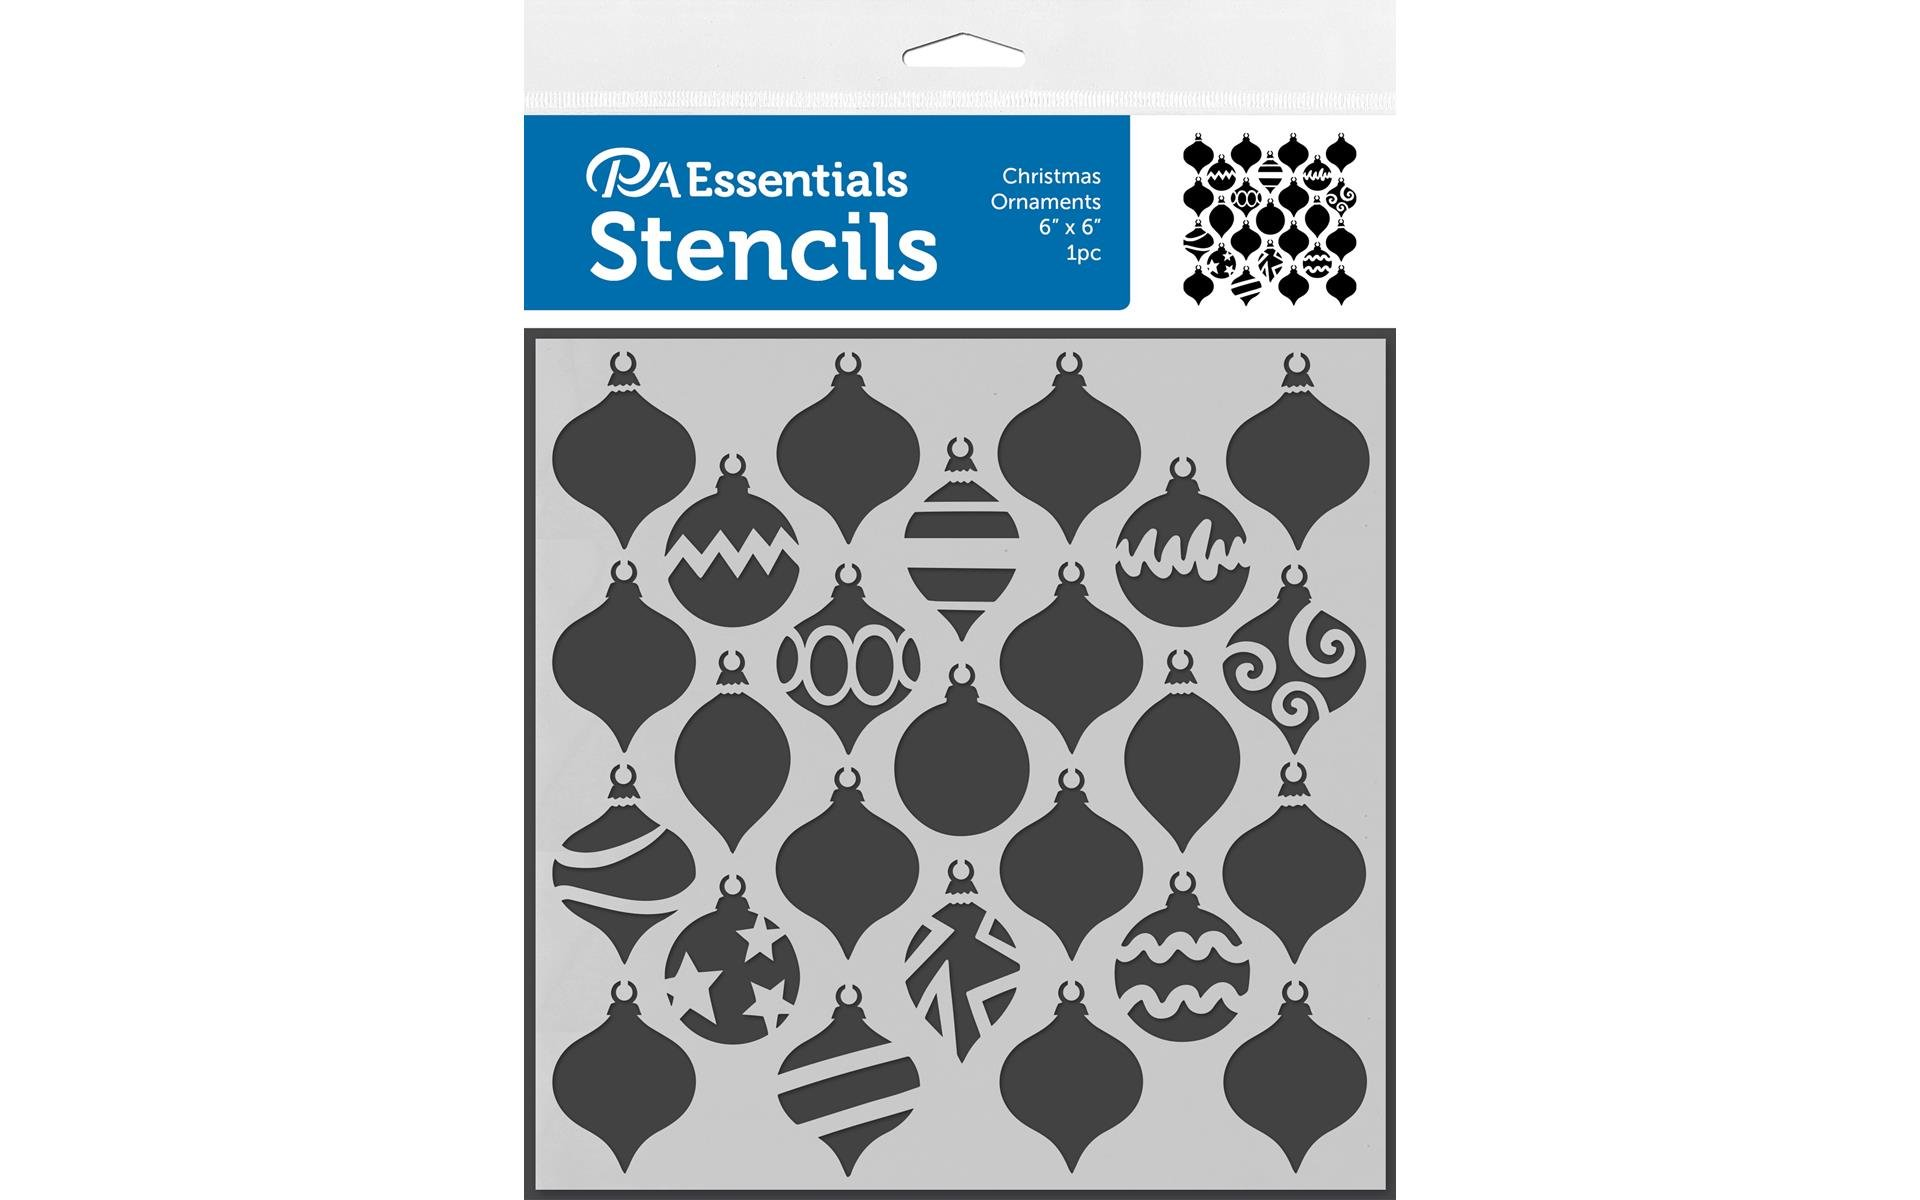 PA Essentials 6x6 Stencil- Christmas Ornaments